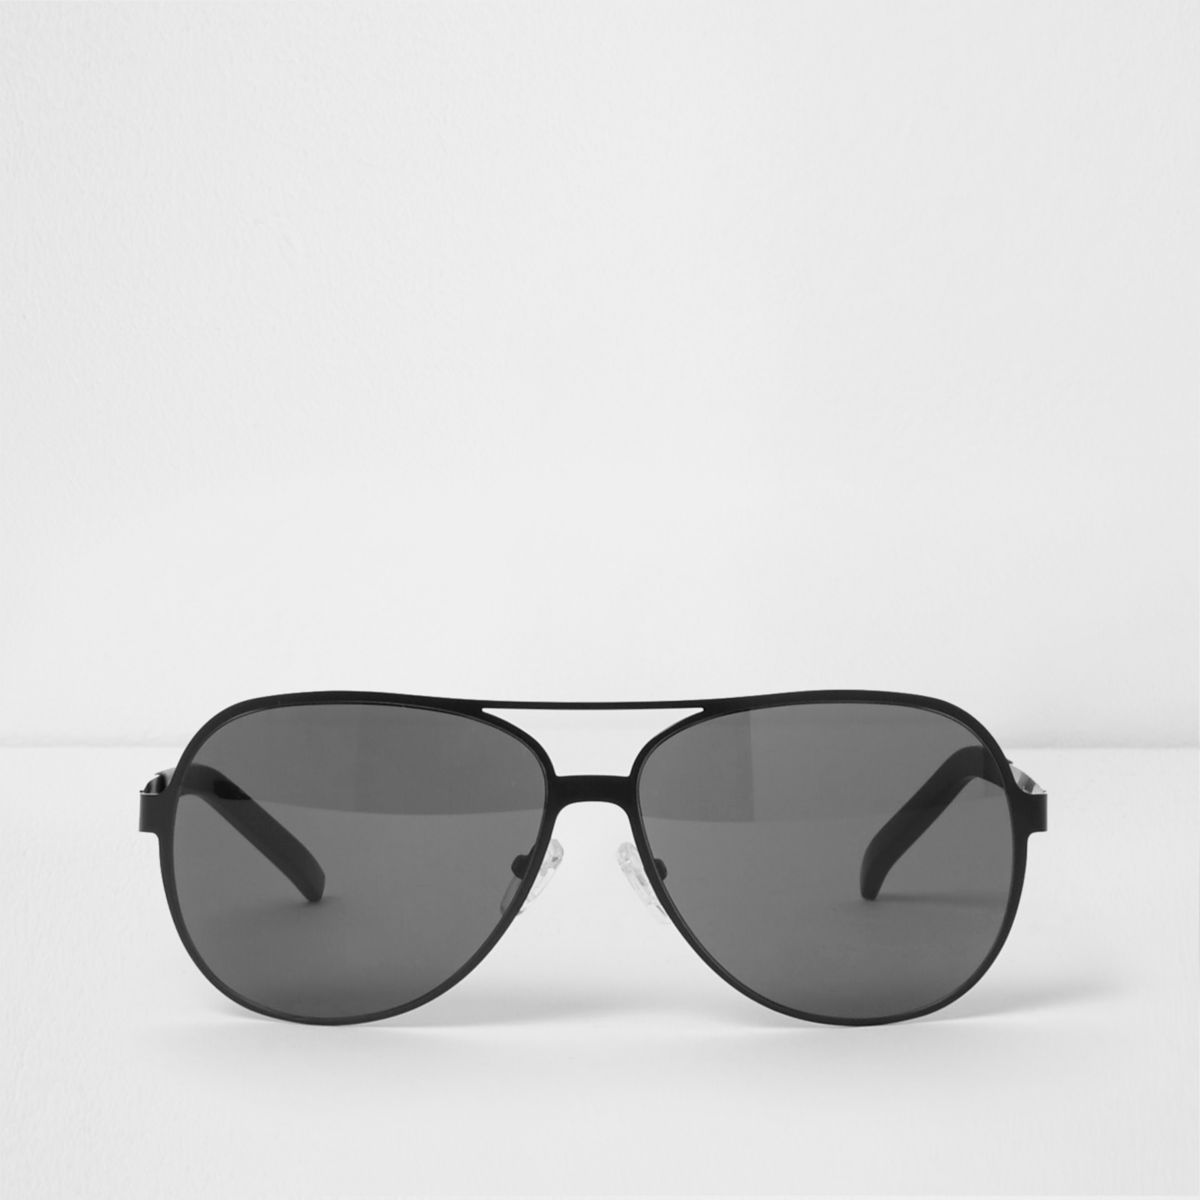 Zwarte pilotenzonnebril met getinte glazen